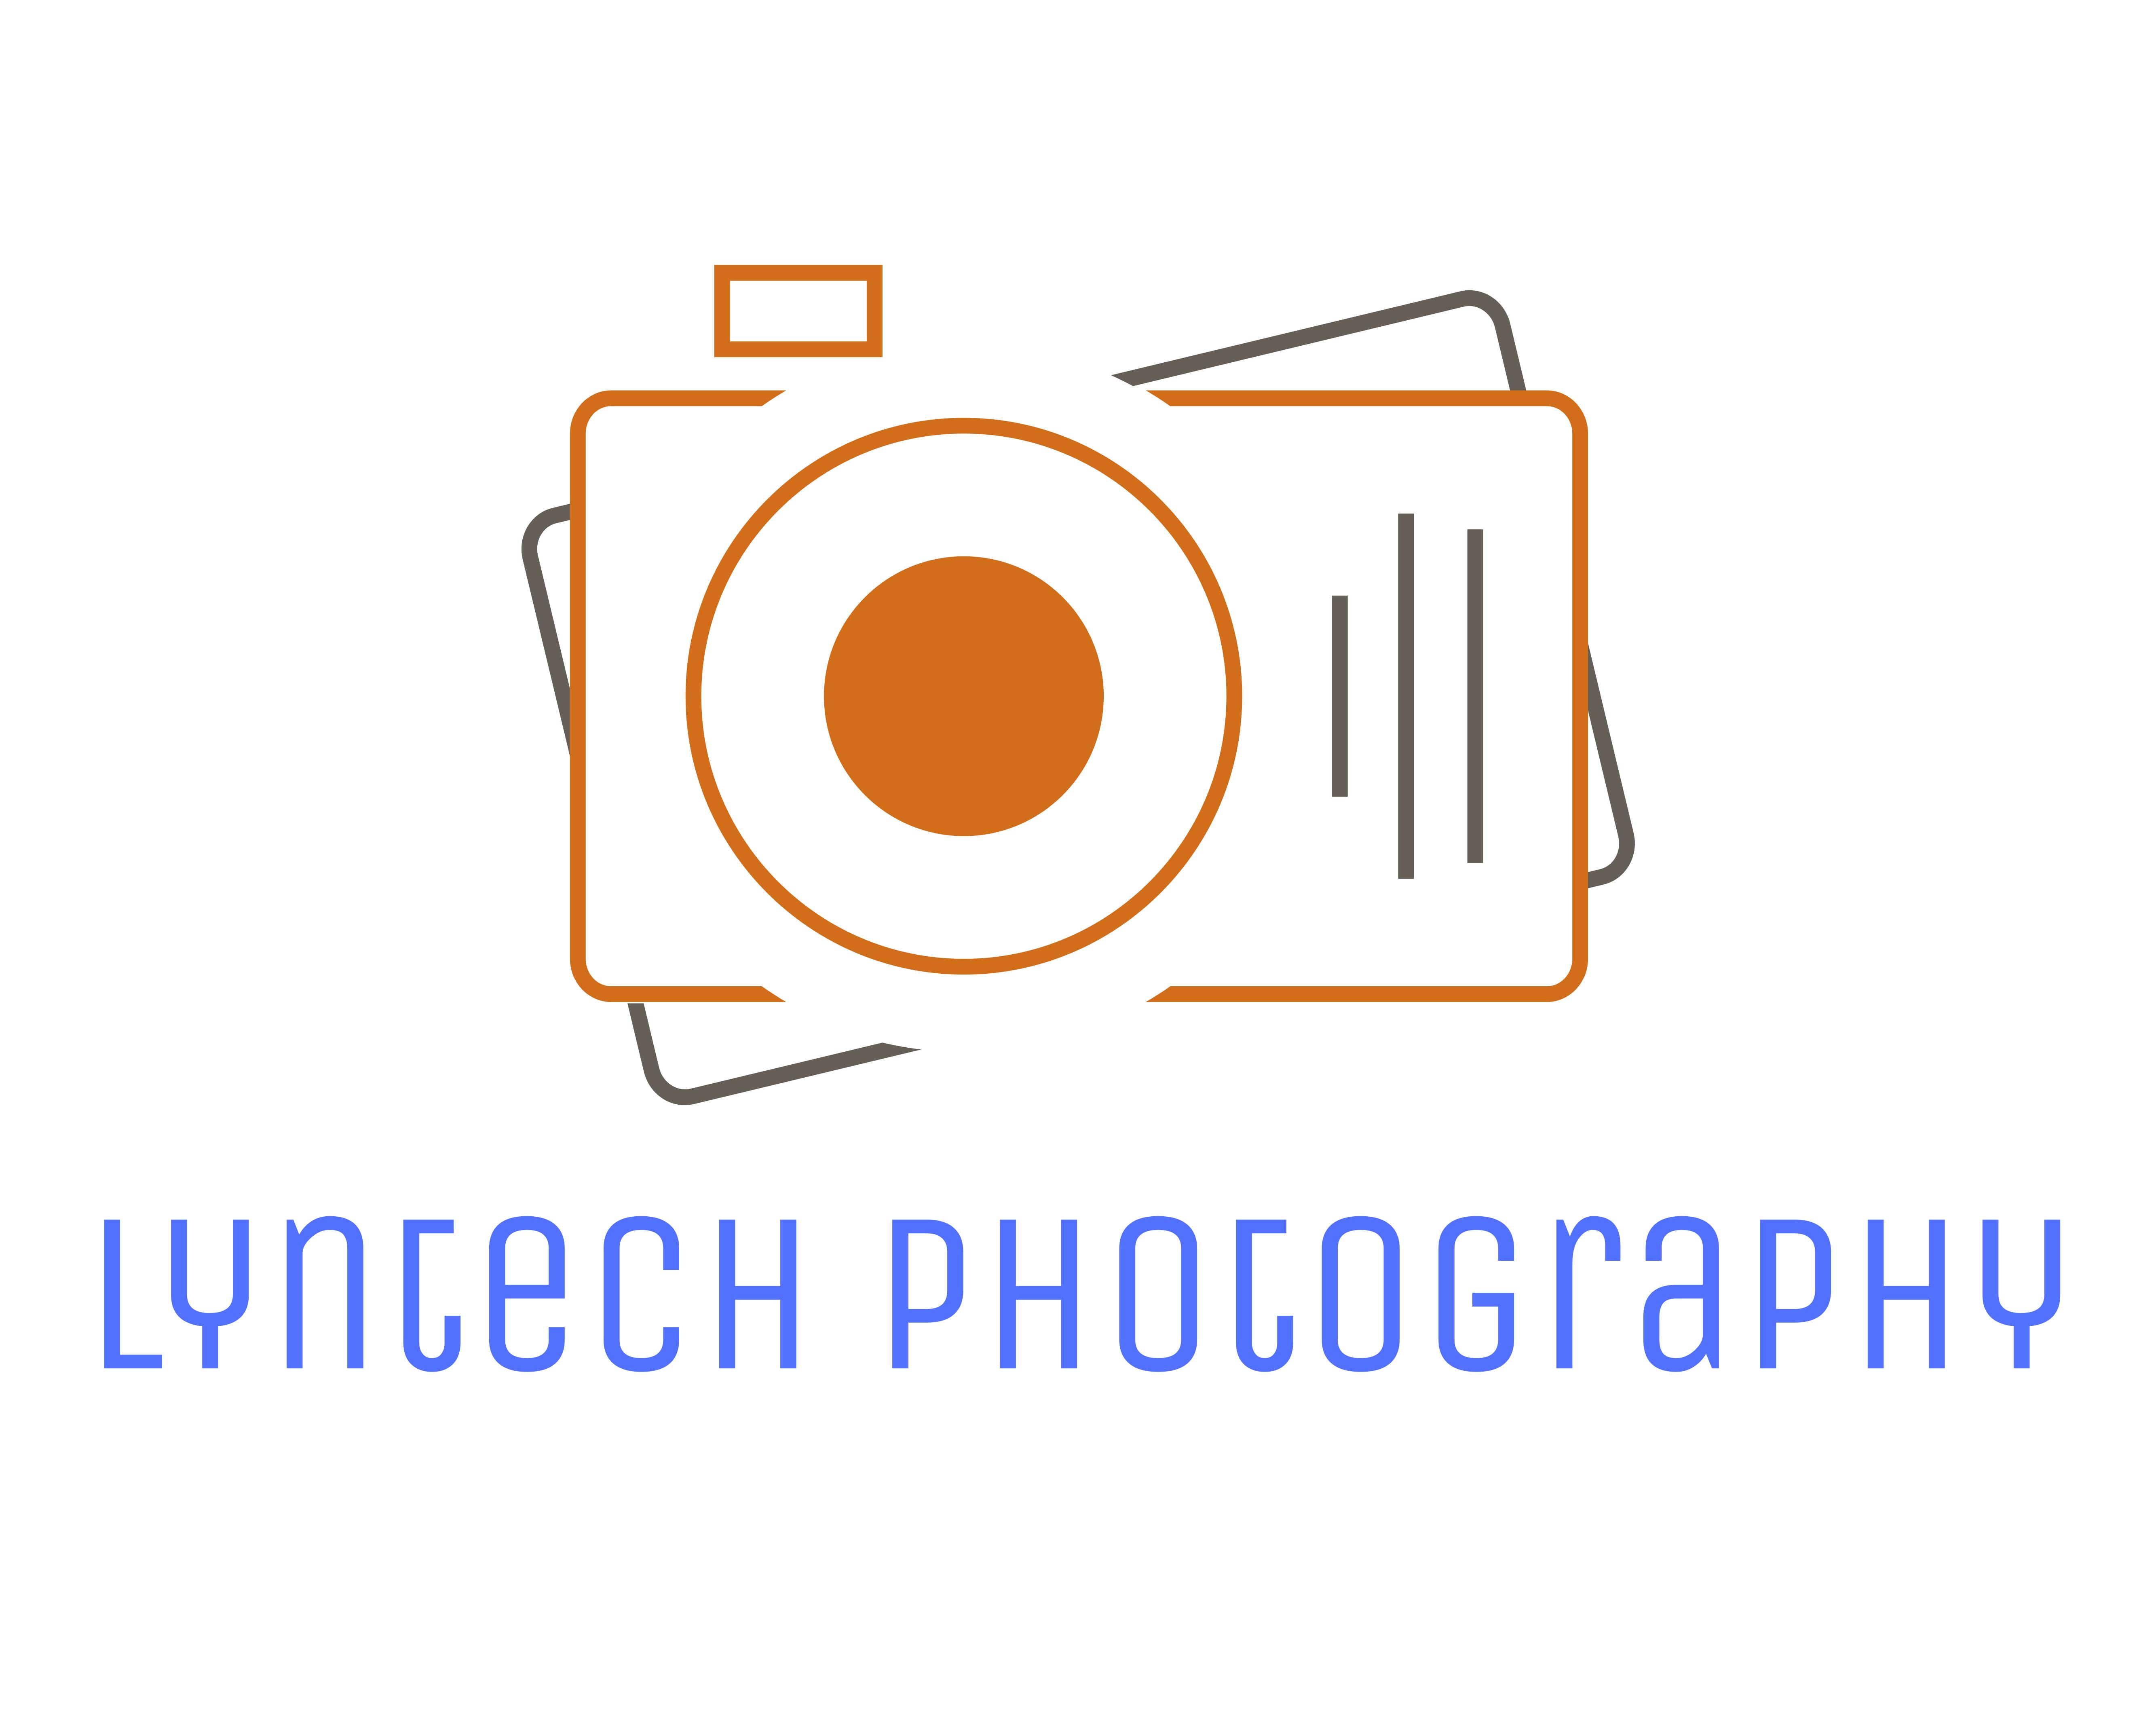 Lyntech Photography floor plan in Canberra